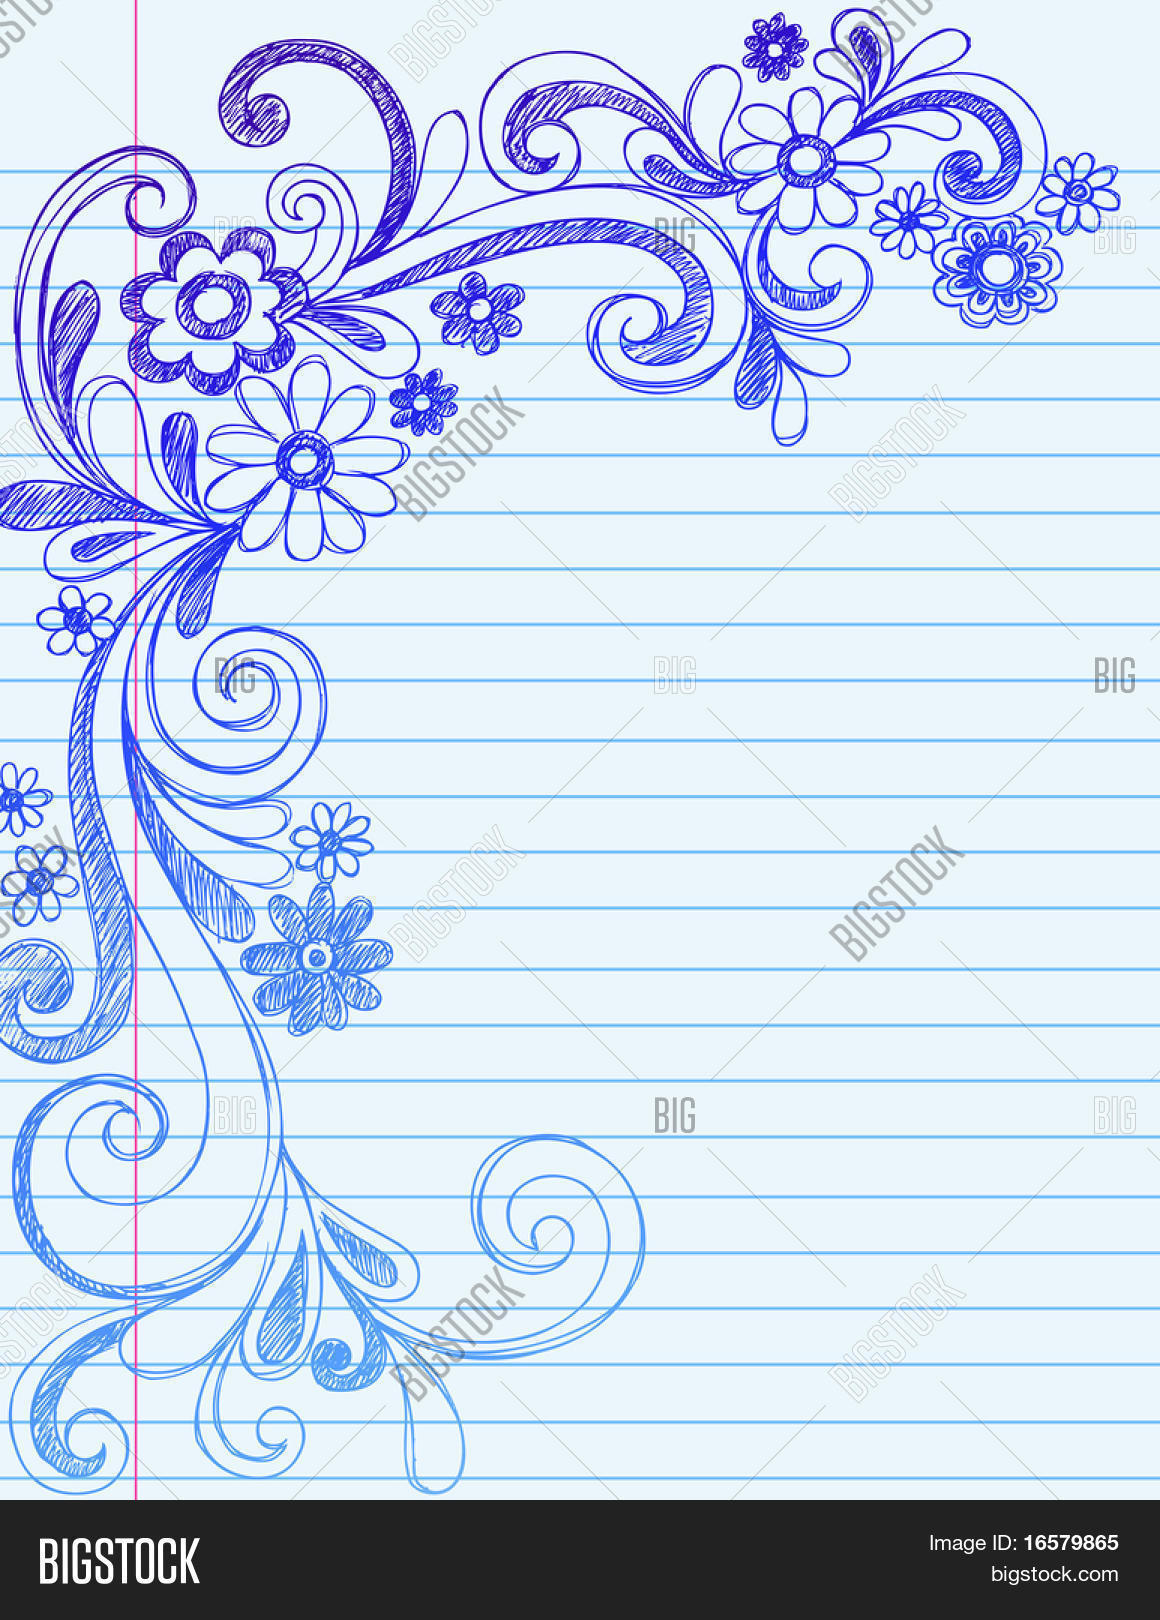 HandDrawn Flower Border Doodles on Lined Notebook Paper Vector – Lined Border Paper